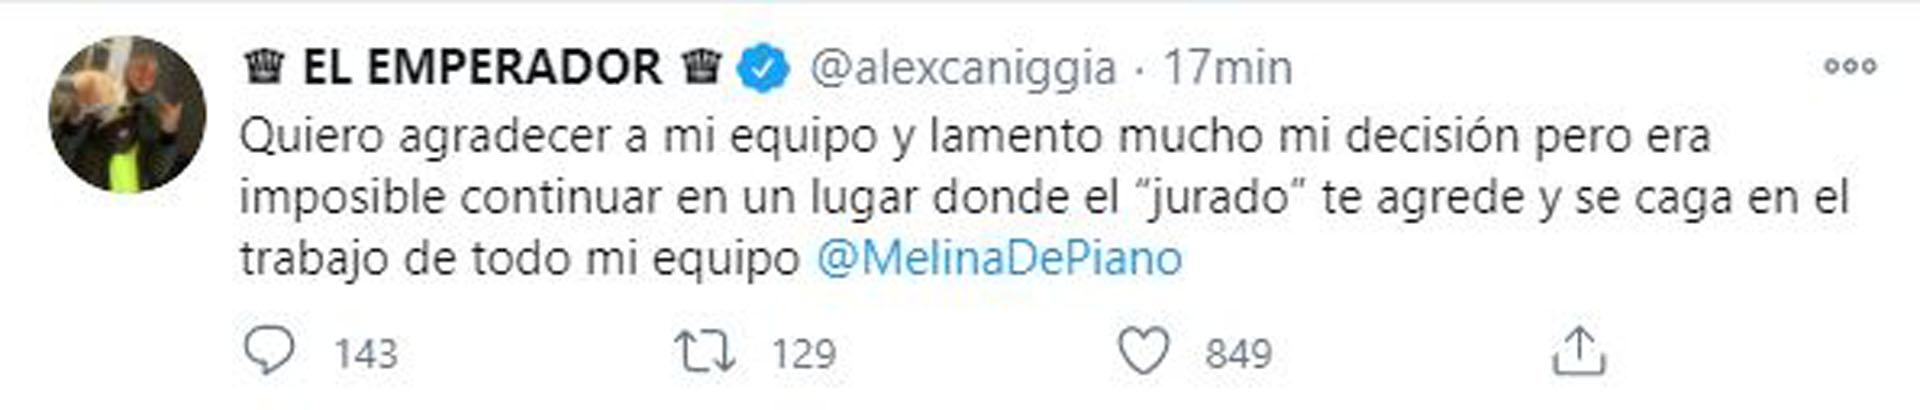 El mensaje de Alex Caniggia después de que quedar oficialmente afuera del